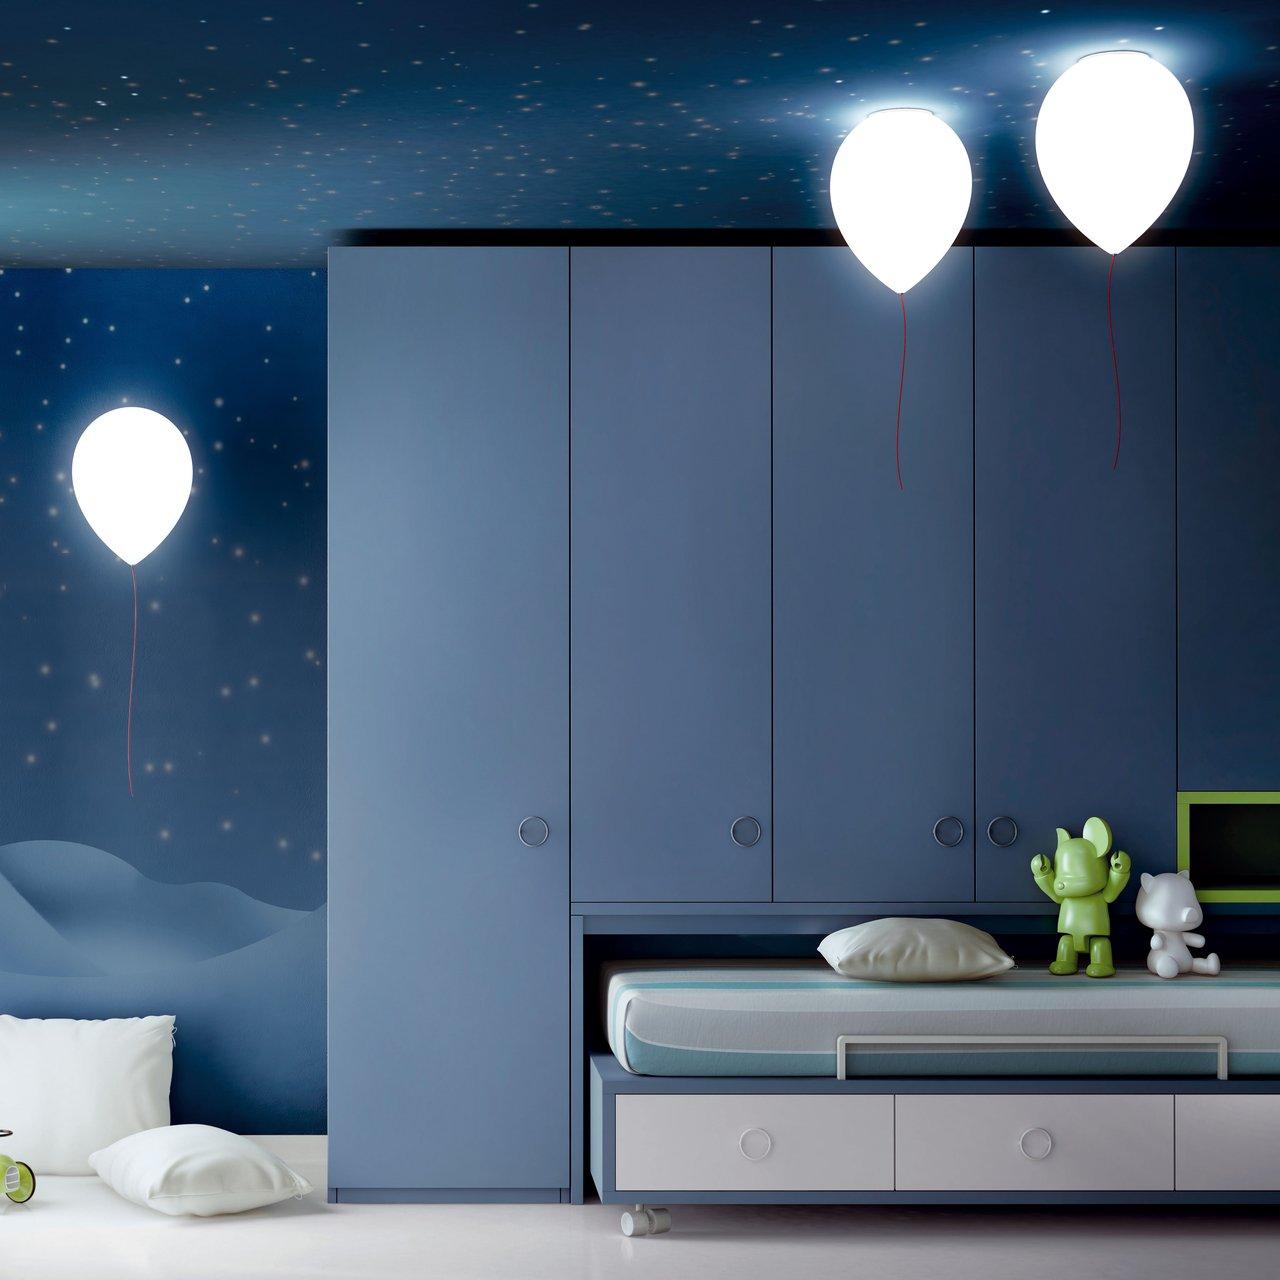 des lampes et appliques ballons de baudruche topito. Black Bedroom Furniture Sets. Home Design Ideas